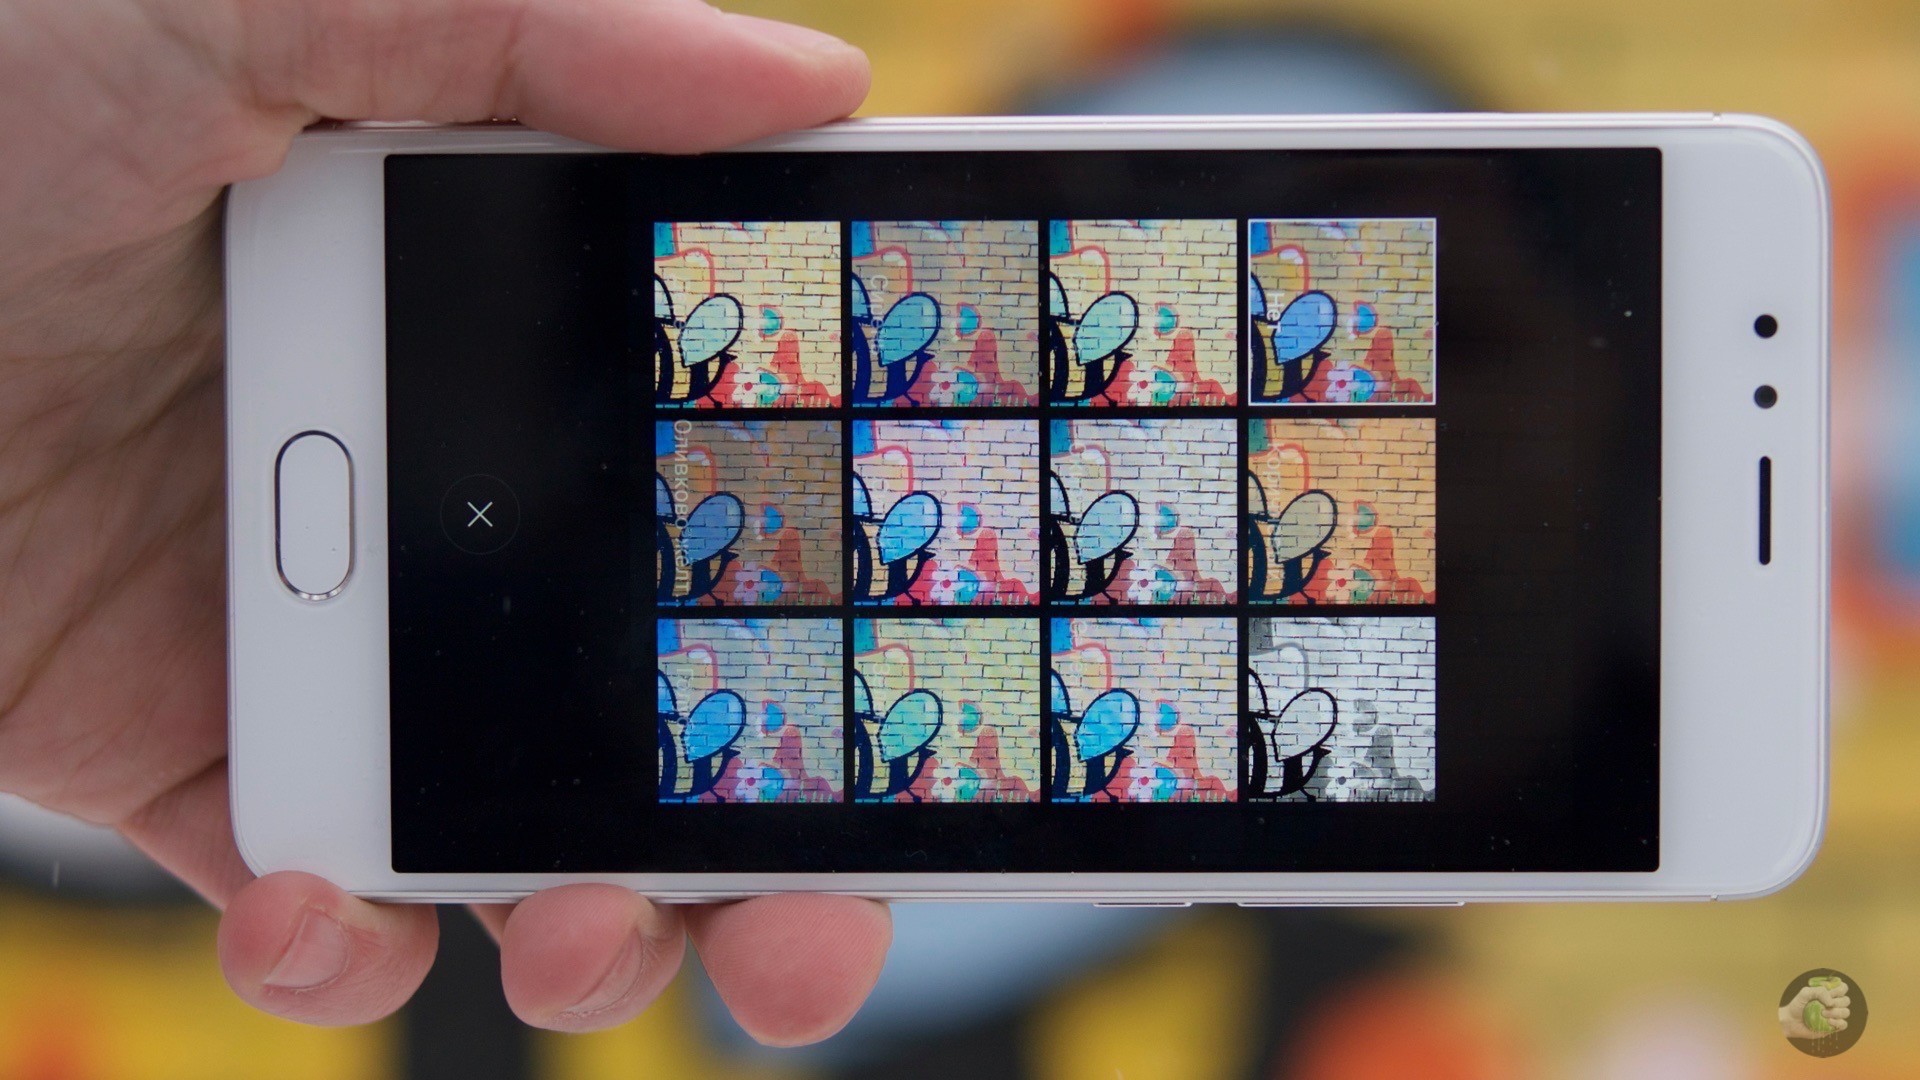 Tempat Jual Meizu M5s 3 32 Gray Update 2018 F496 Gpd Xd Universal Simulator Android Games 32gb 5s Wylsacom 5